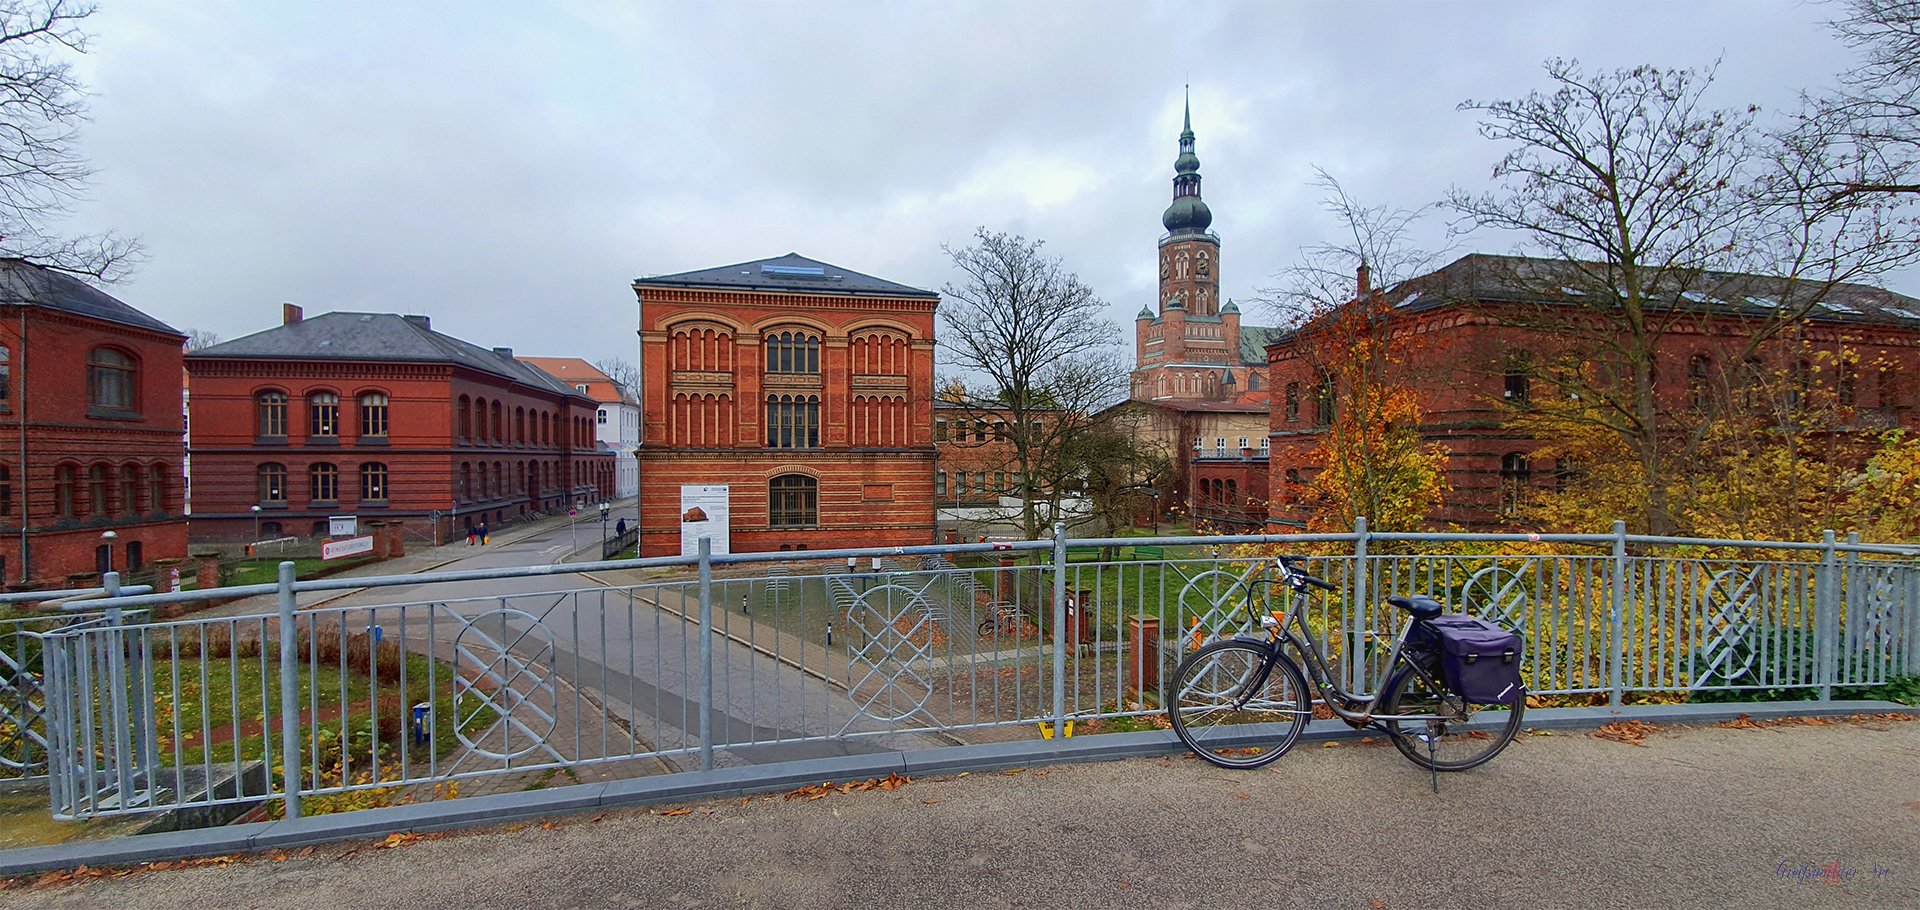 Universitäts- und Hansestadt Greifswald